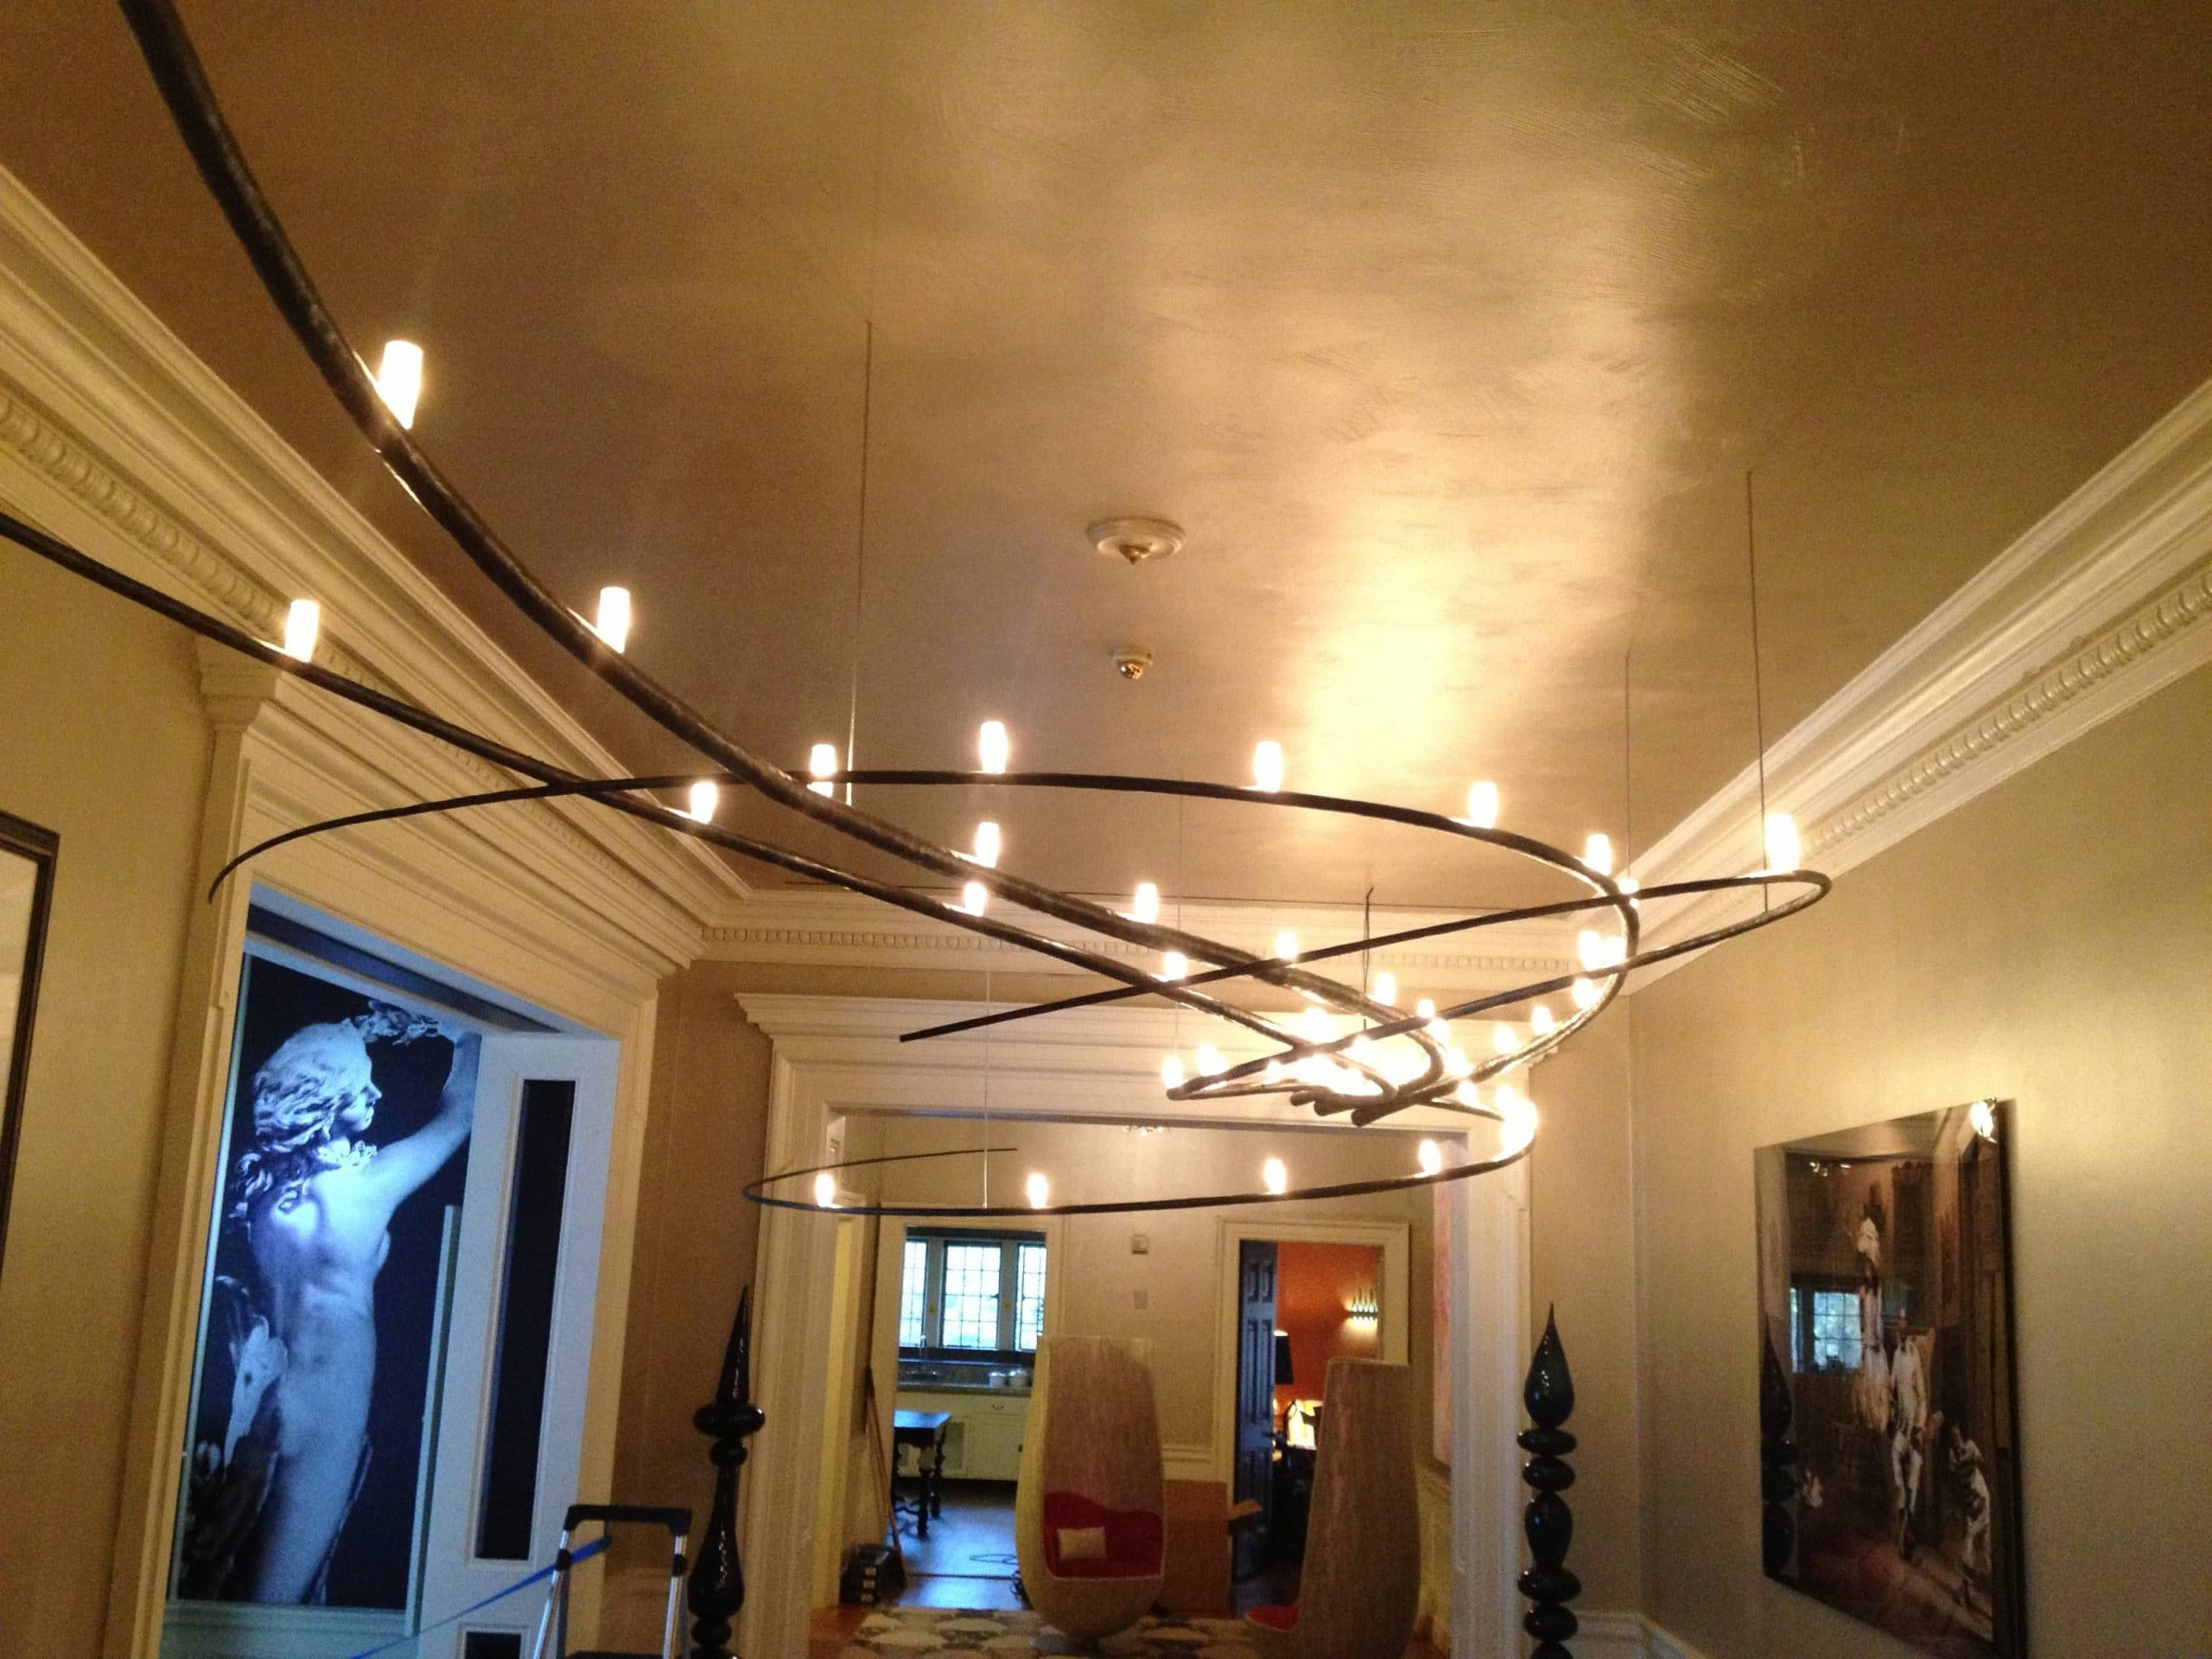 p chandeliers light rubbed maxim vine oil elegante chandelier bronze lighting